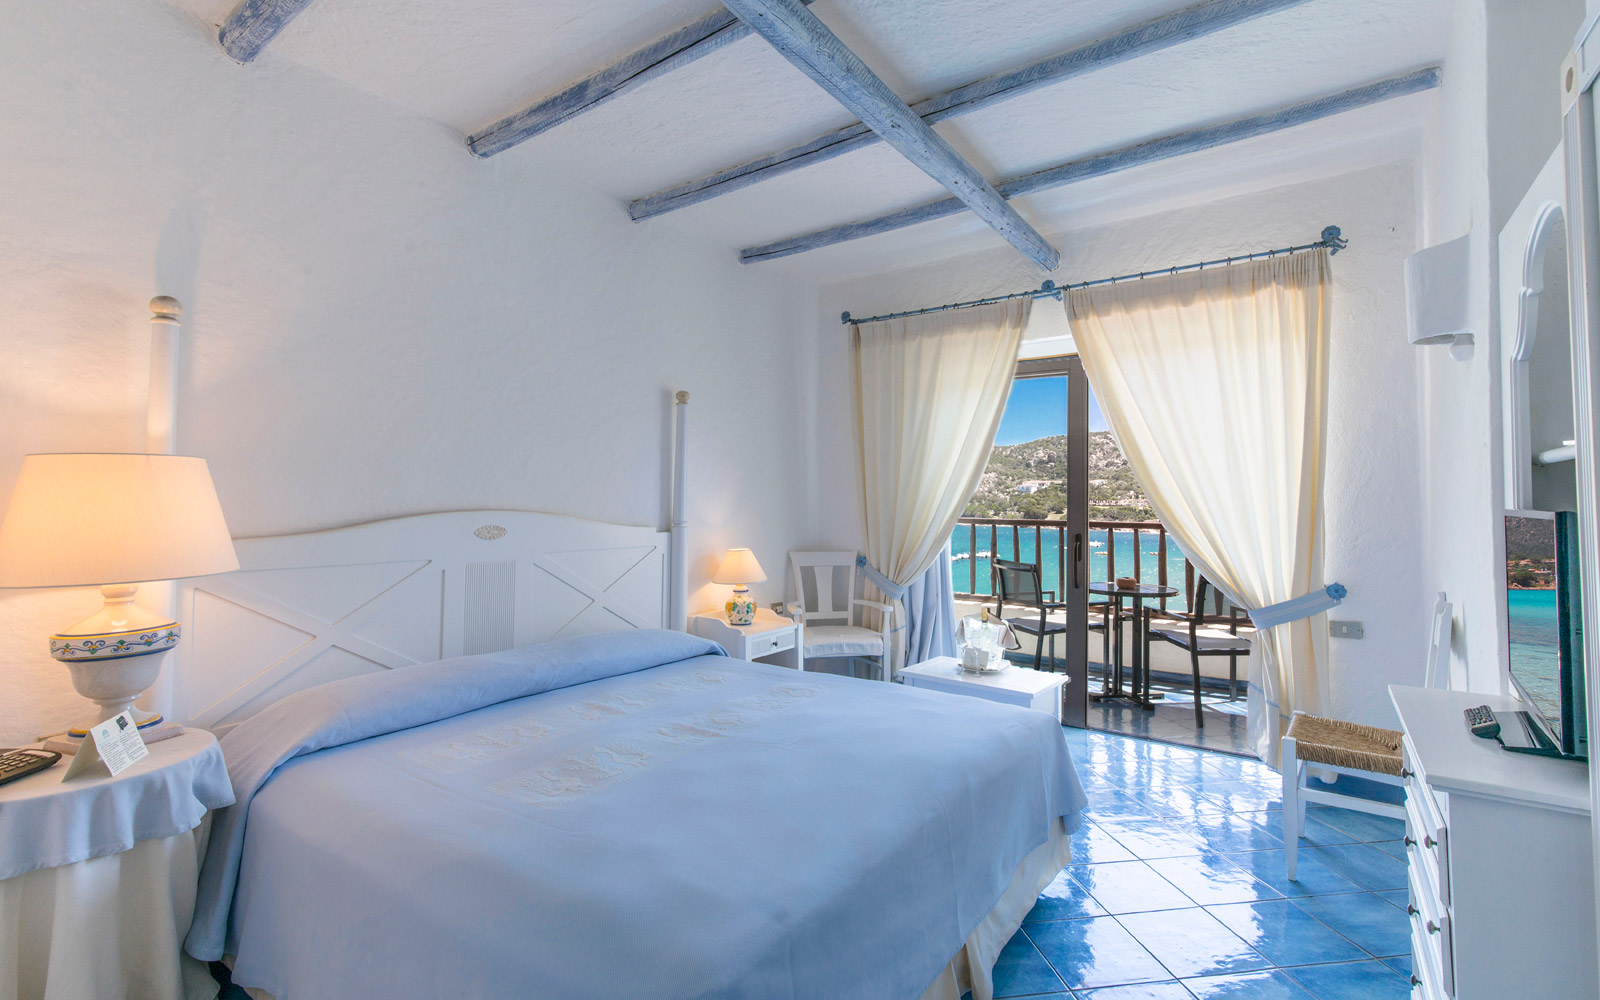 Room 224 - Club Hotel